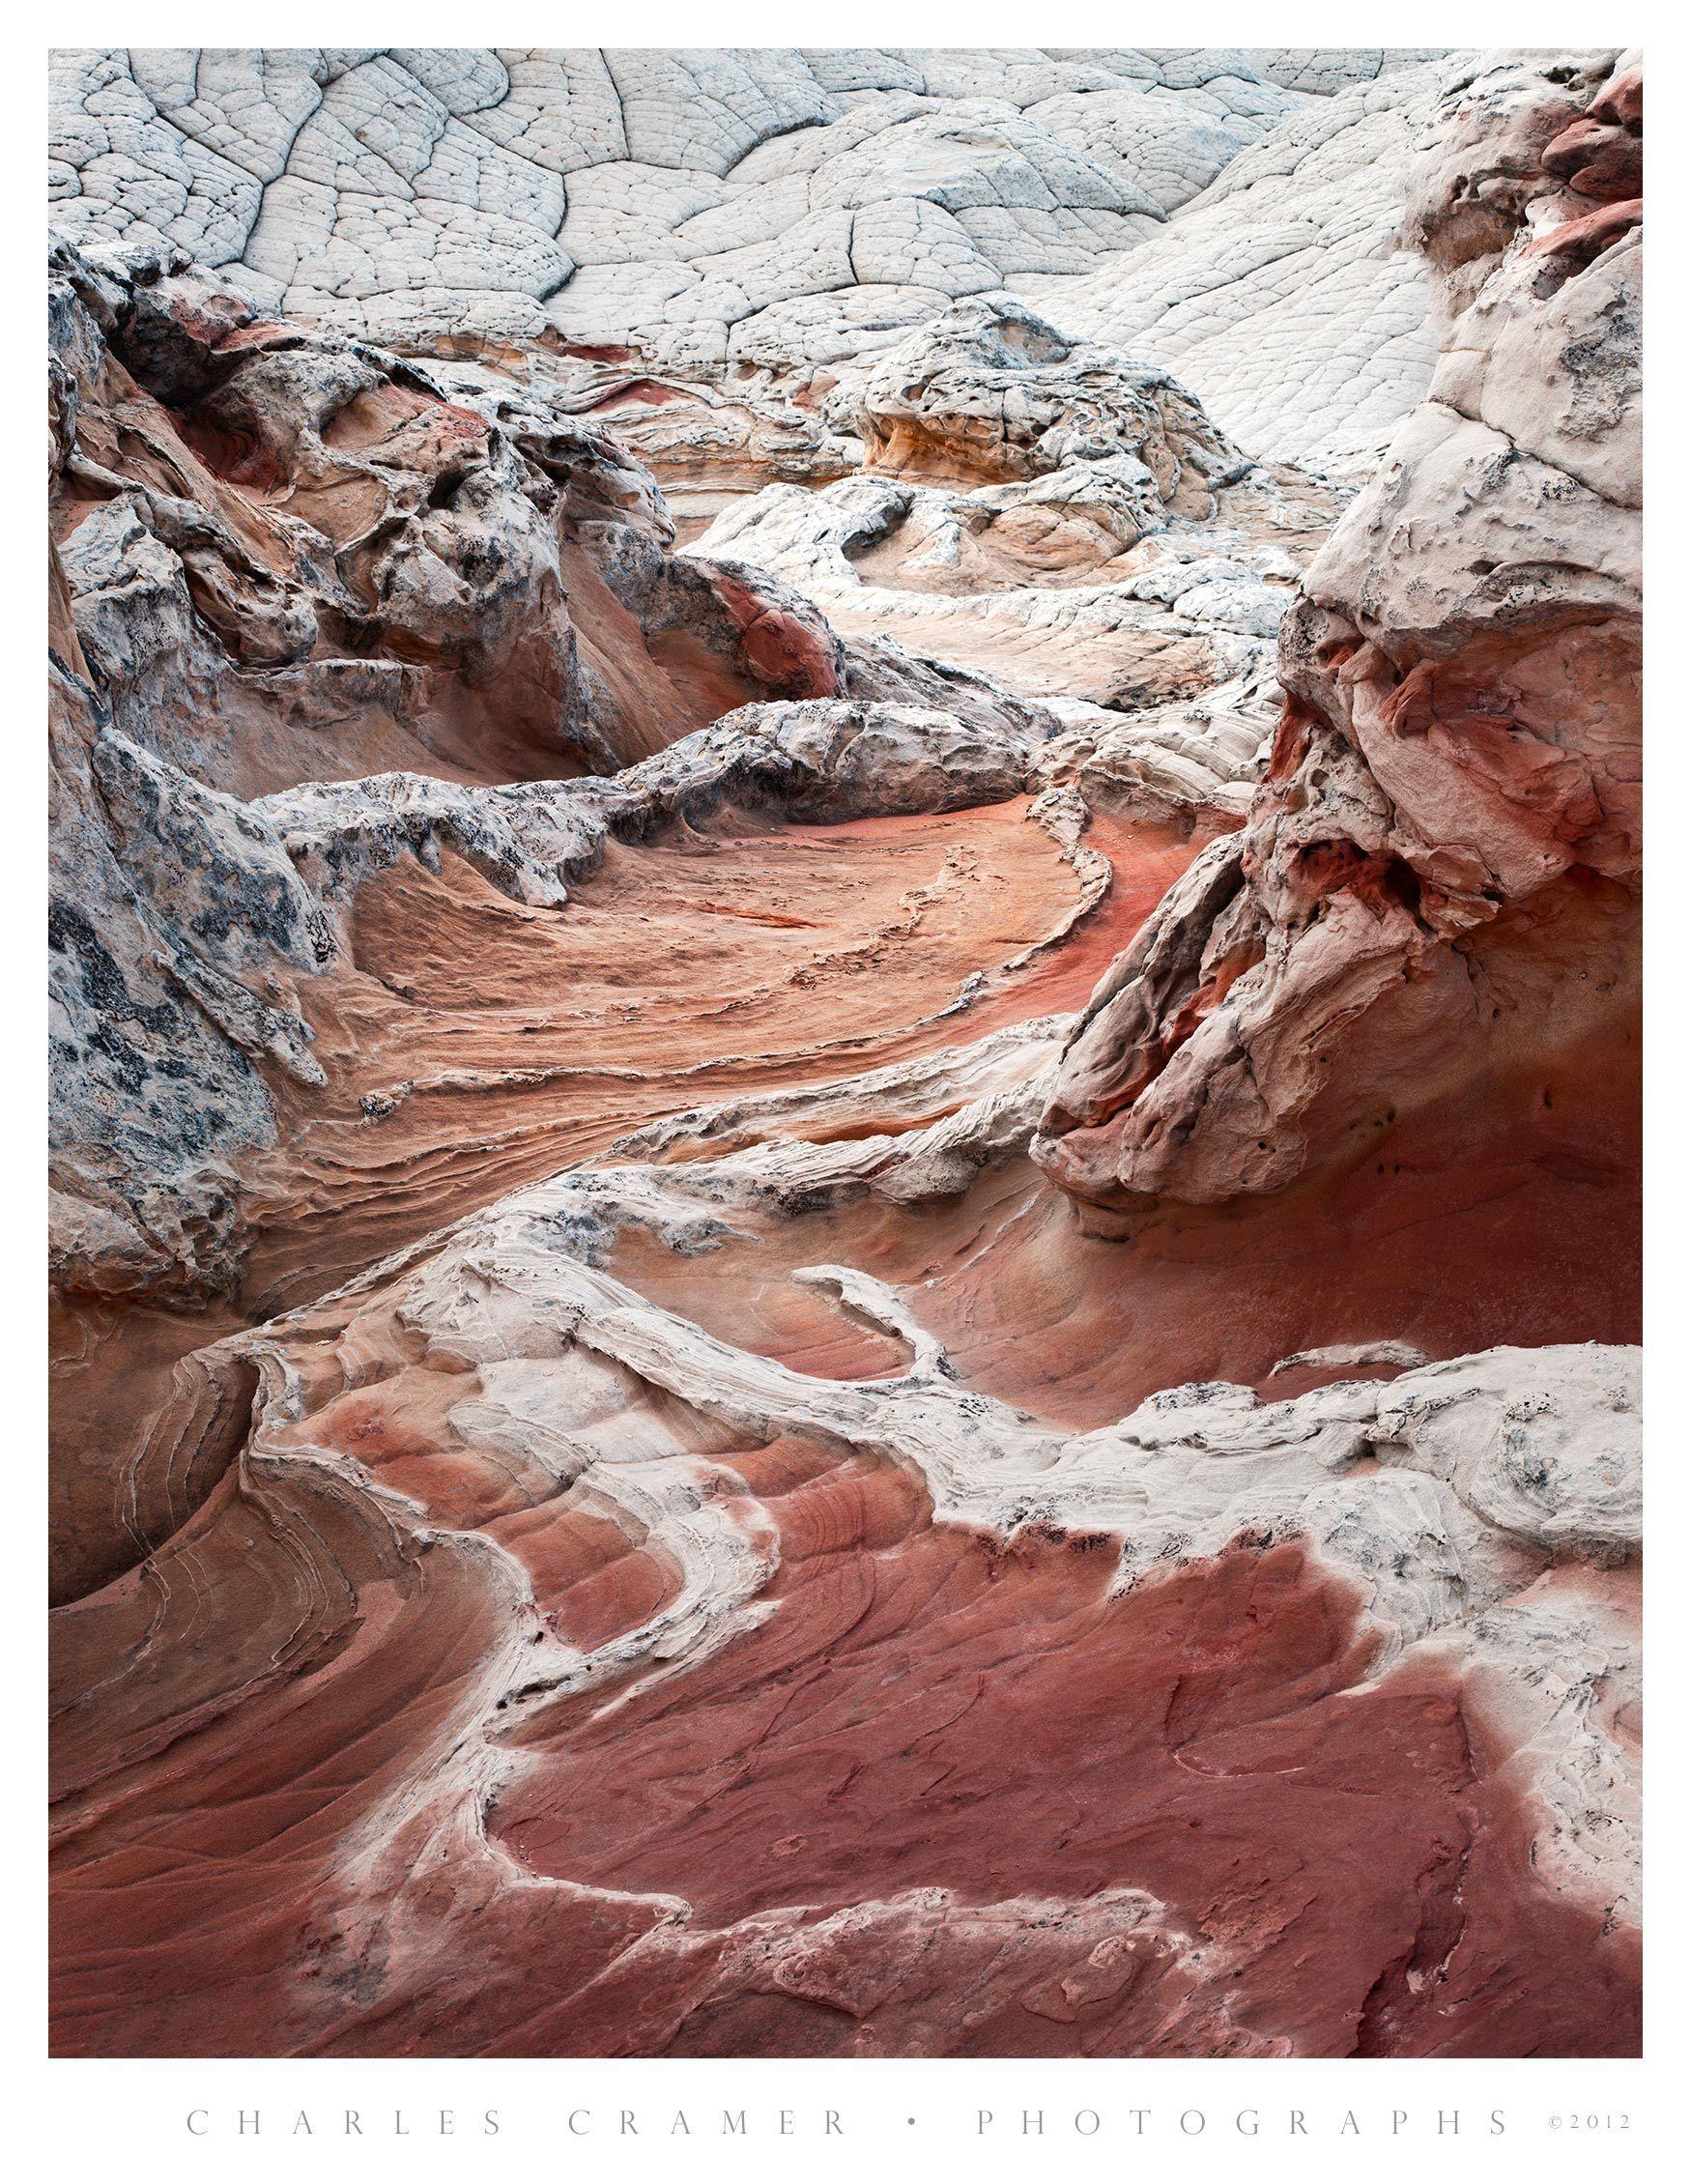 Red and White Sandstone,  Vermilion Cliffs National Monument, Utah